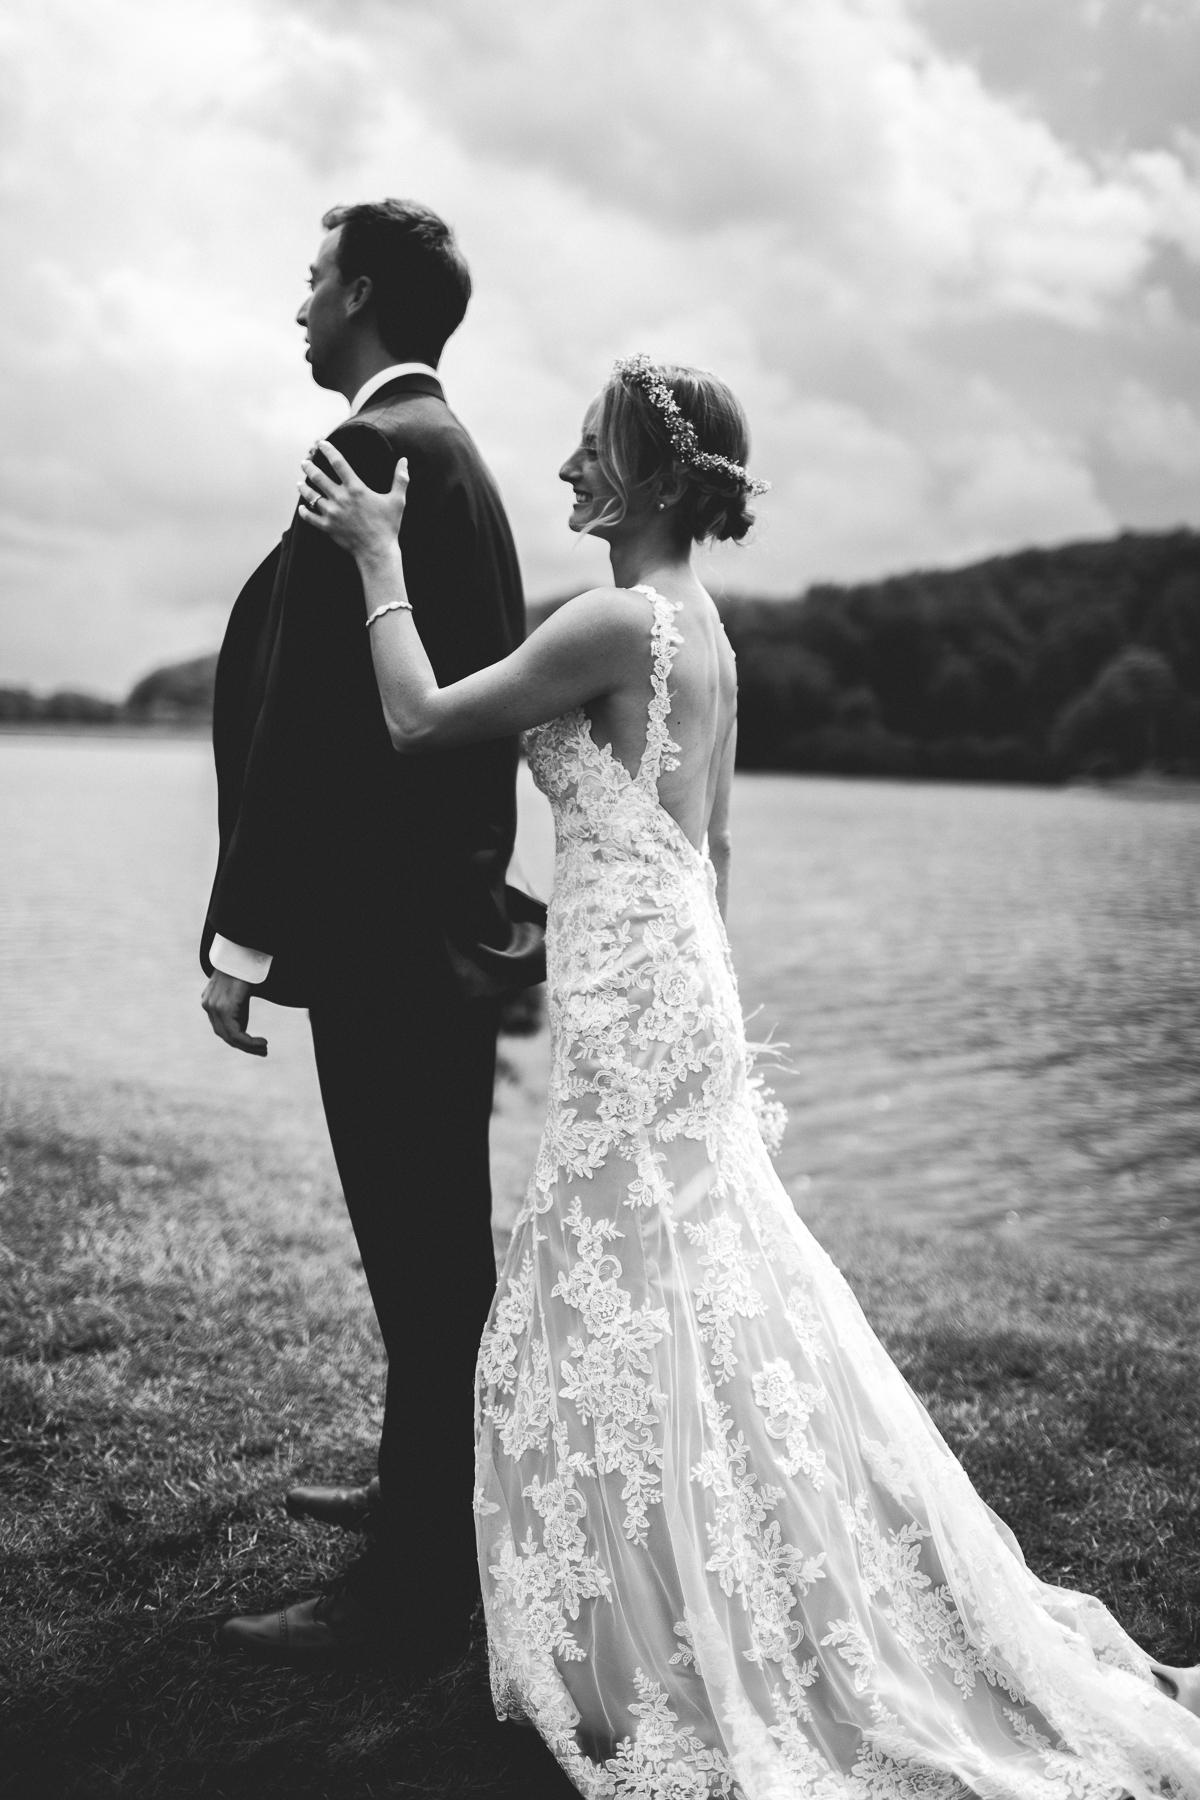 taylor-travis-grandfather-mountain-kelley-raye-north-carolina-wedding-photographer-34.jpg